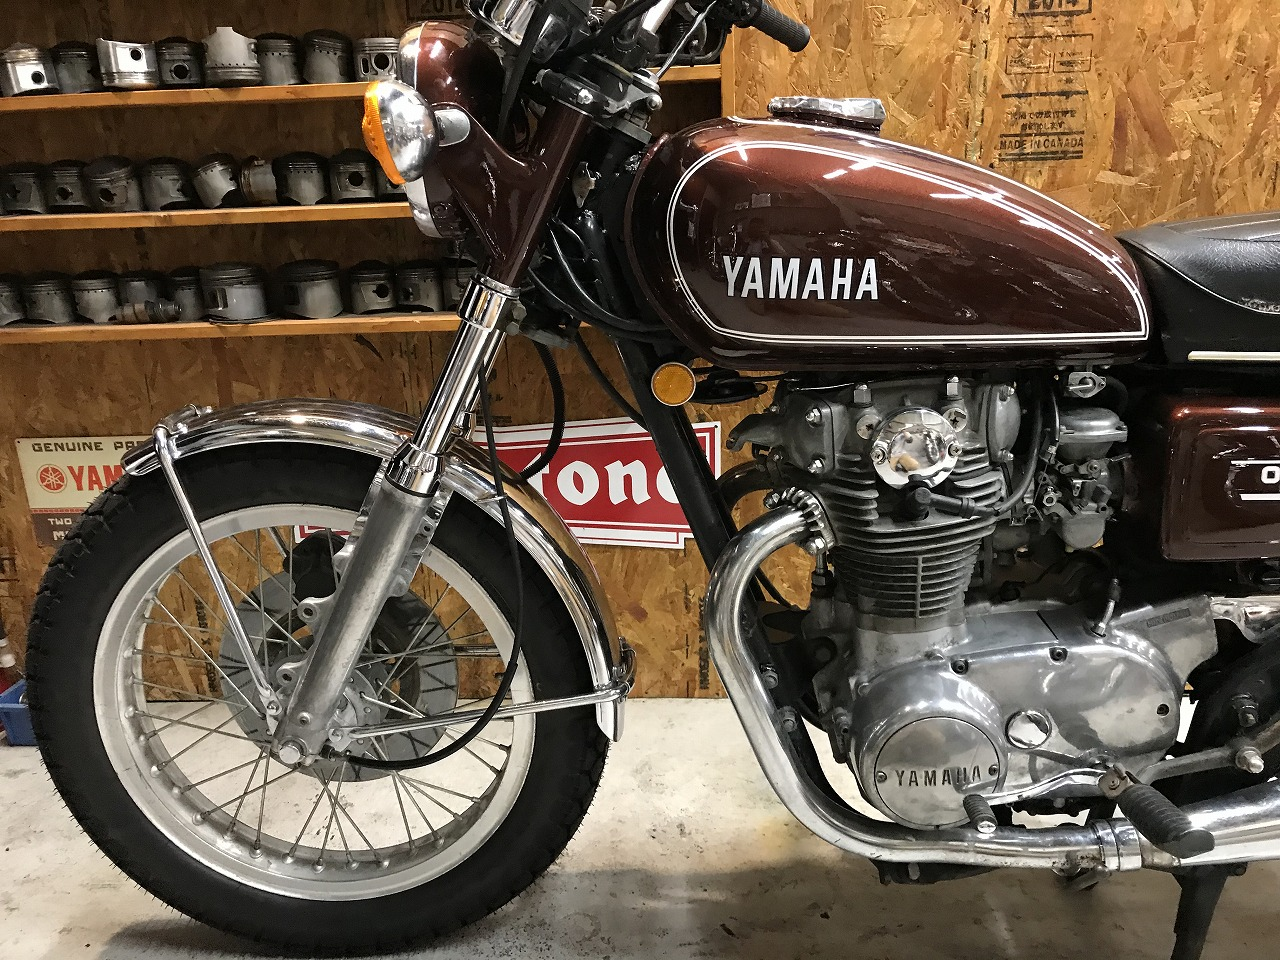 TX650Ⅰ-19